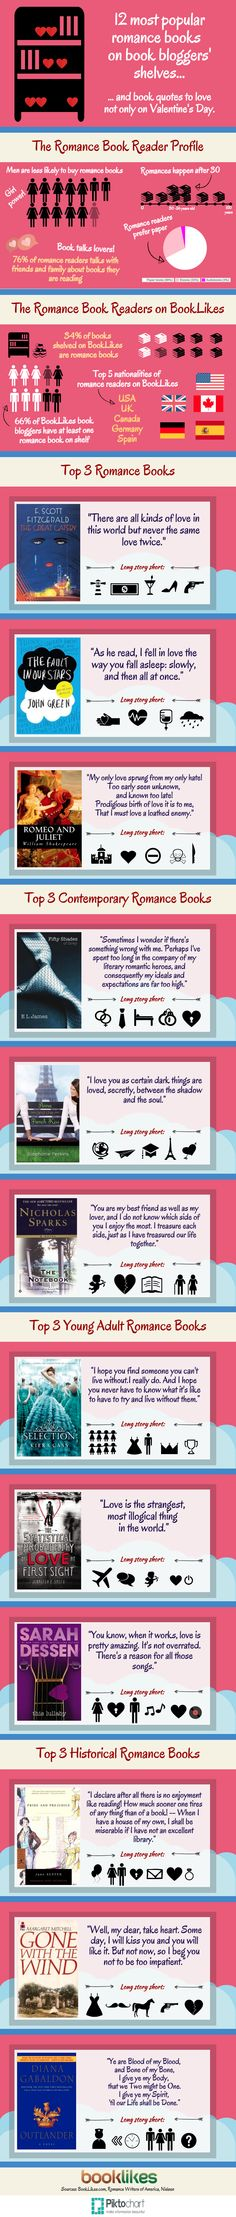 ♥ Top 12 Romance Books On Book Bloggers' Shelves - BookLikes